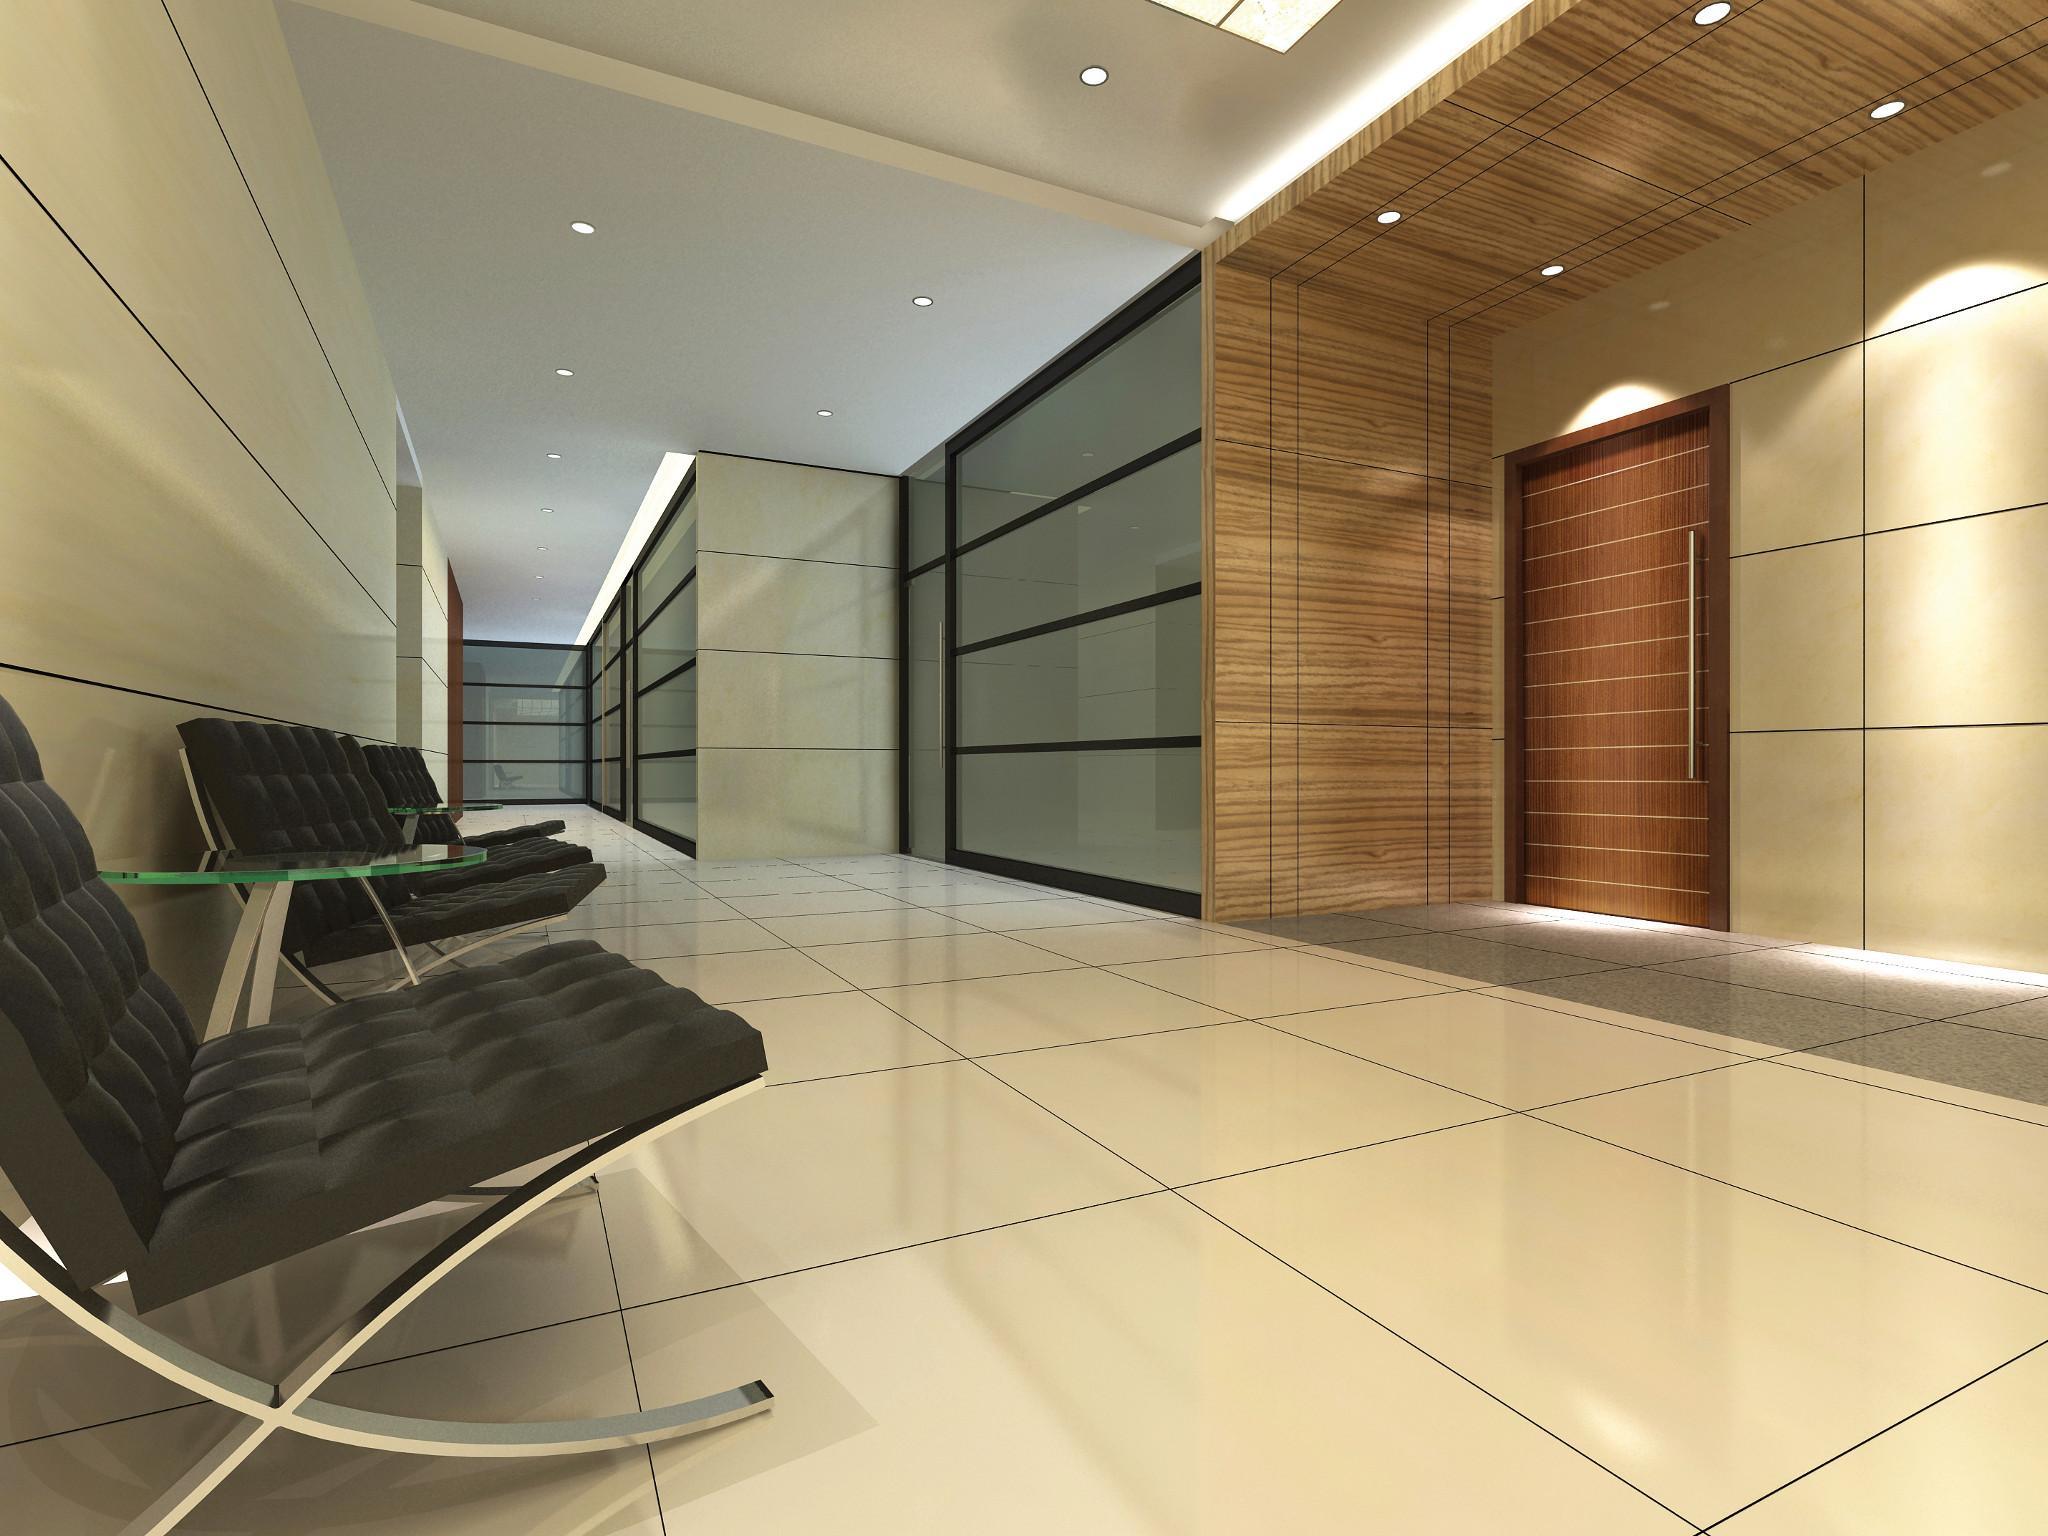 Masonite Aspiro Wood Veneer doors in an office lobby